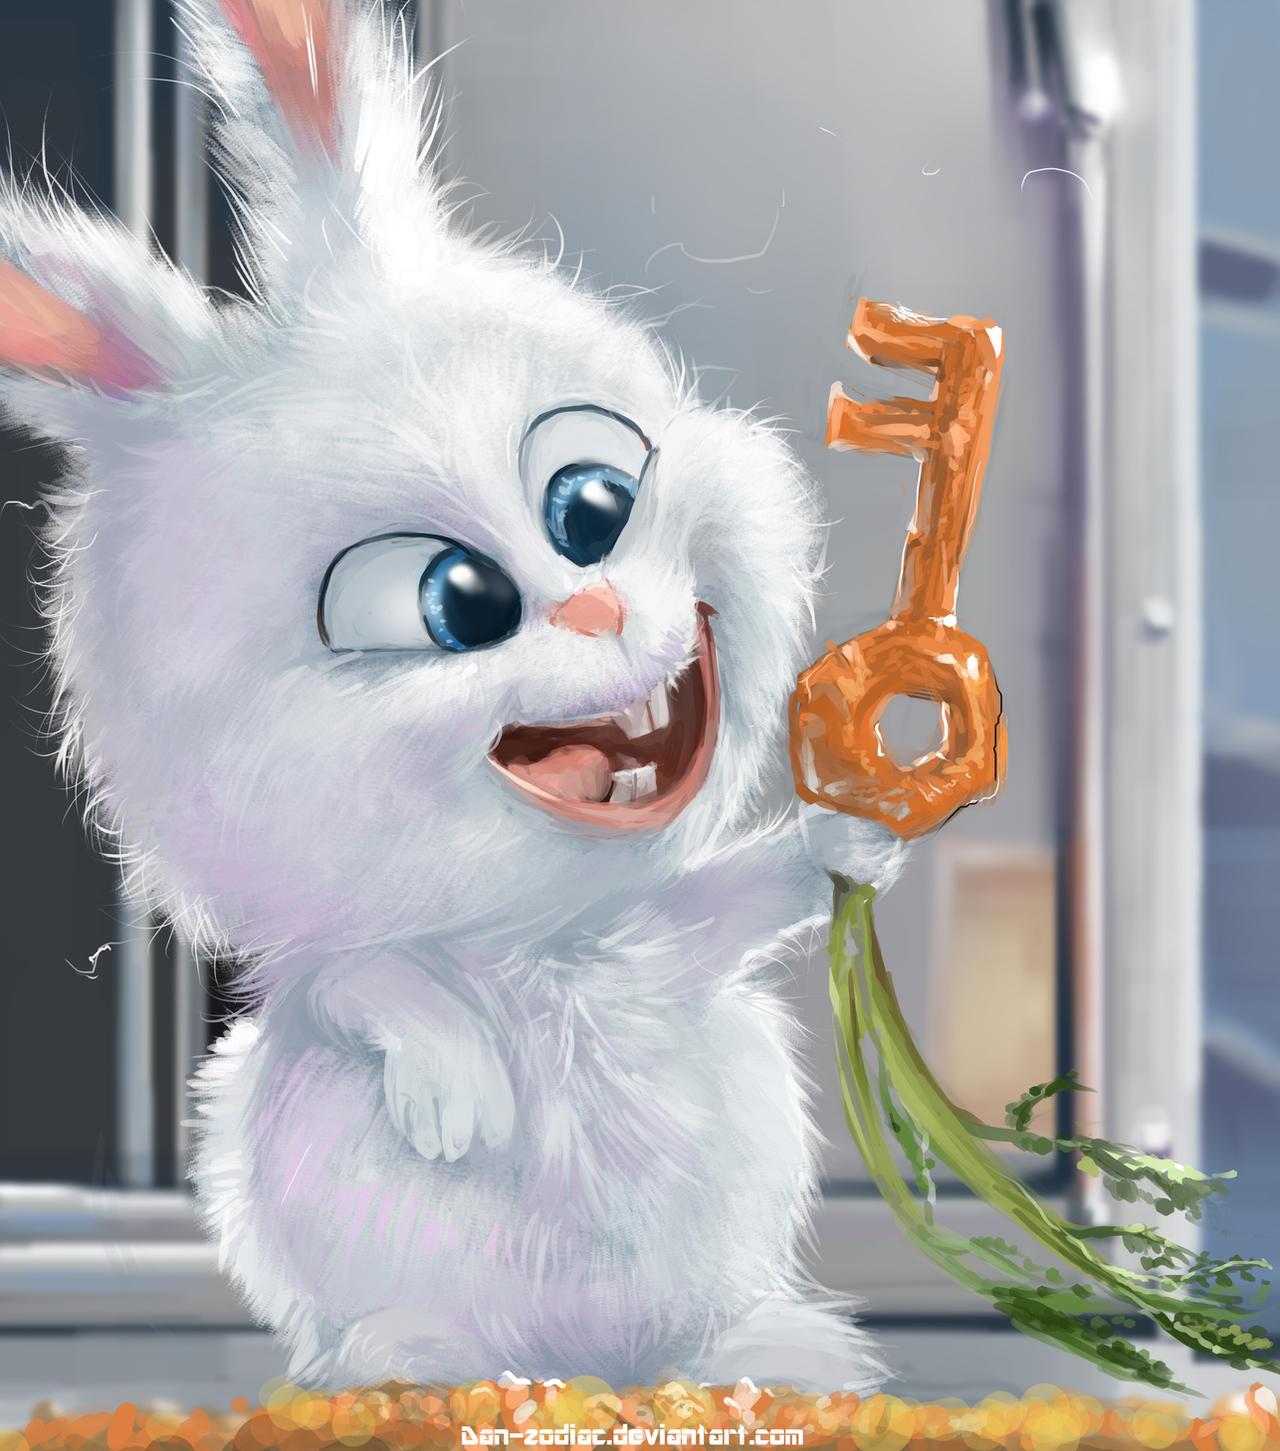 Fanart : The Secret Life Of Pets : Snowball By Dan-zodiac